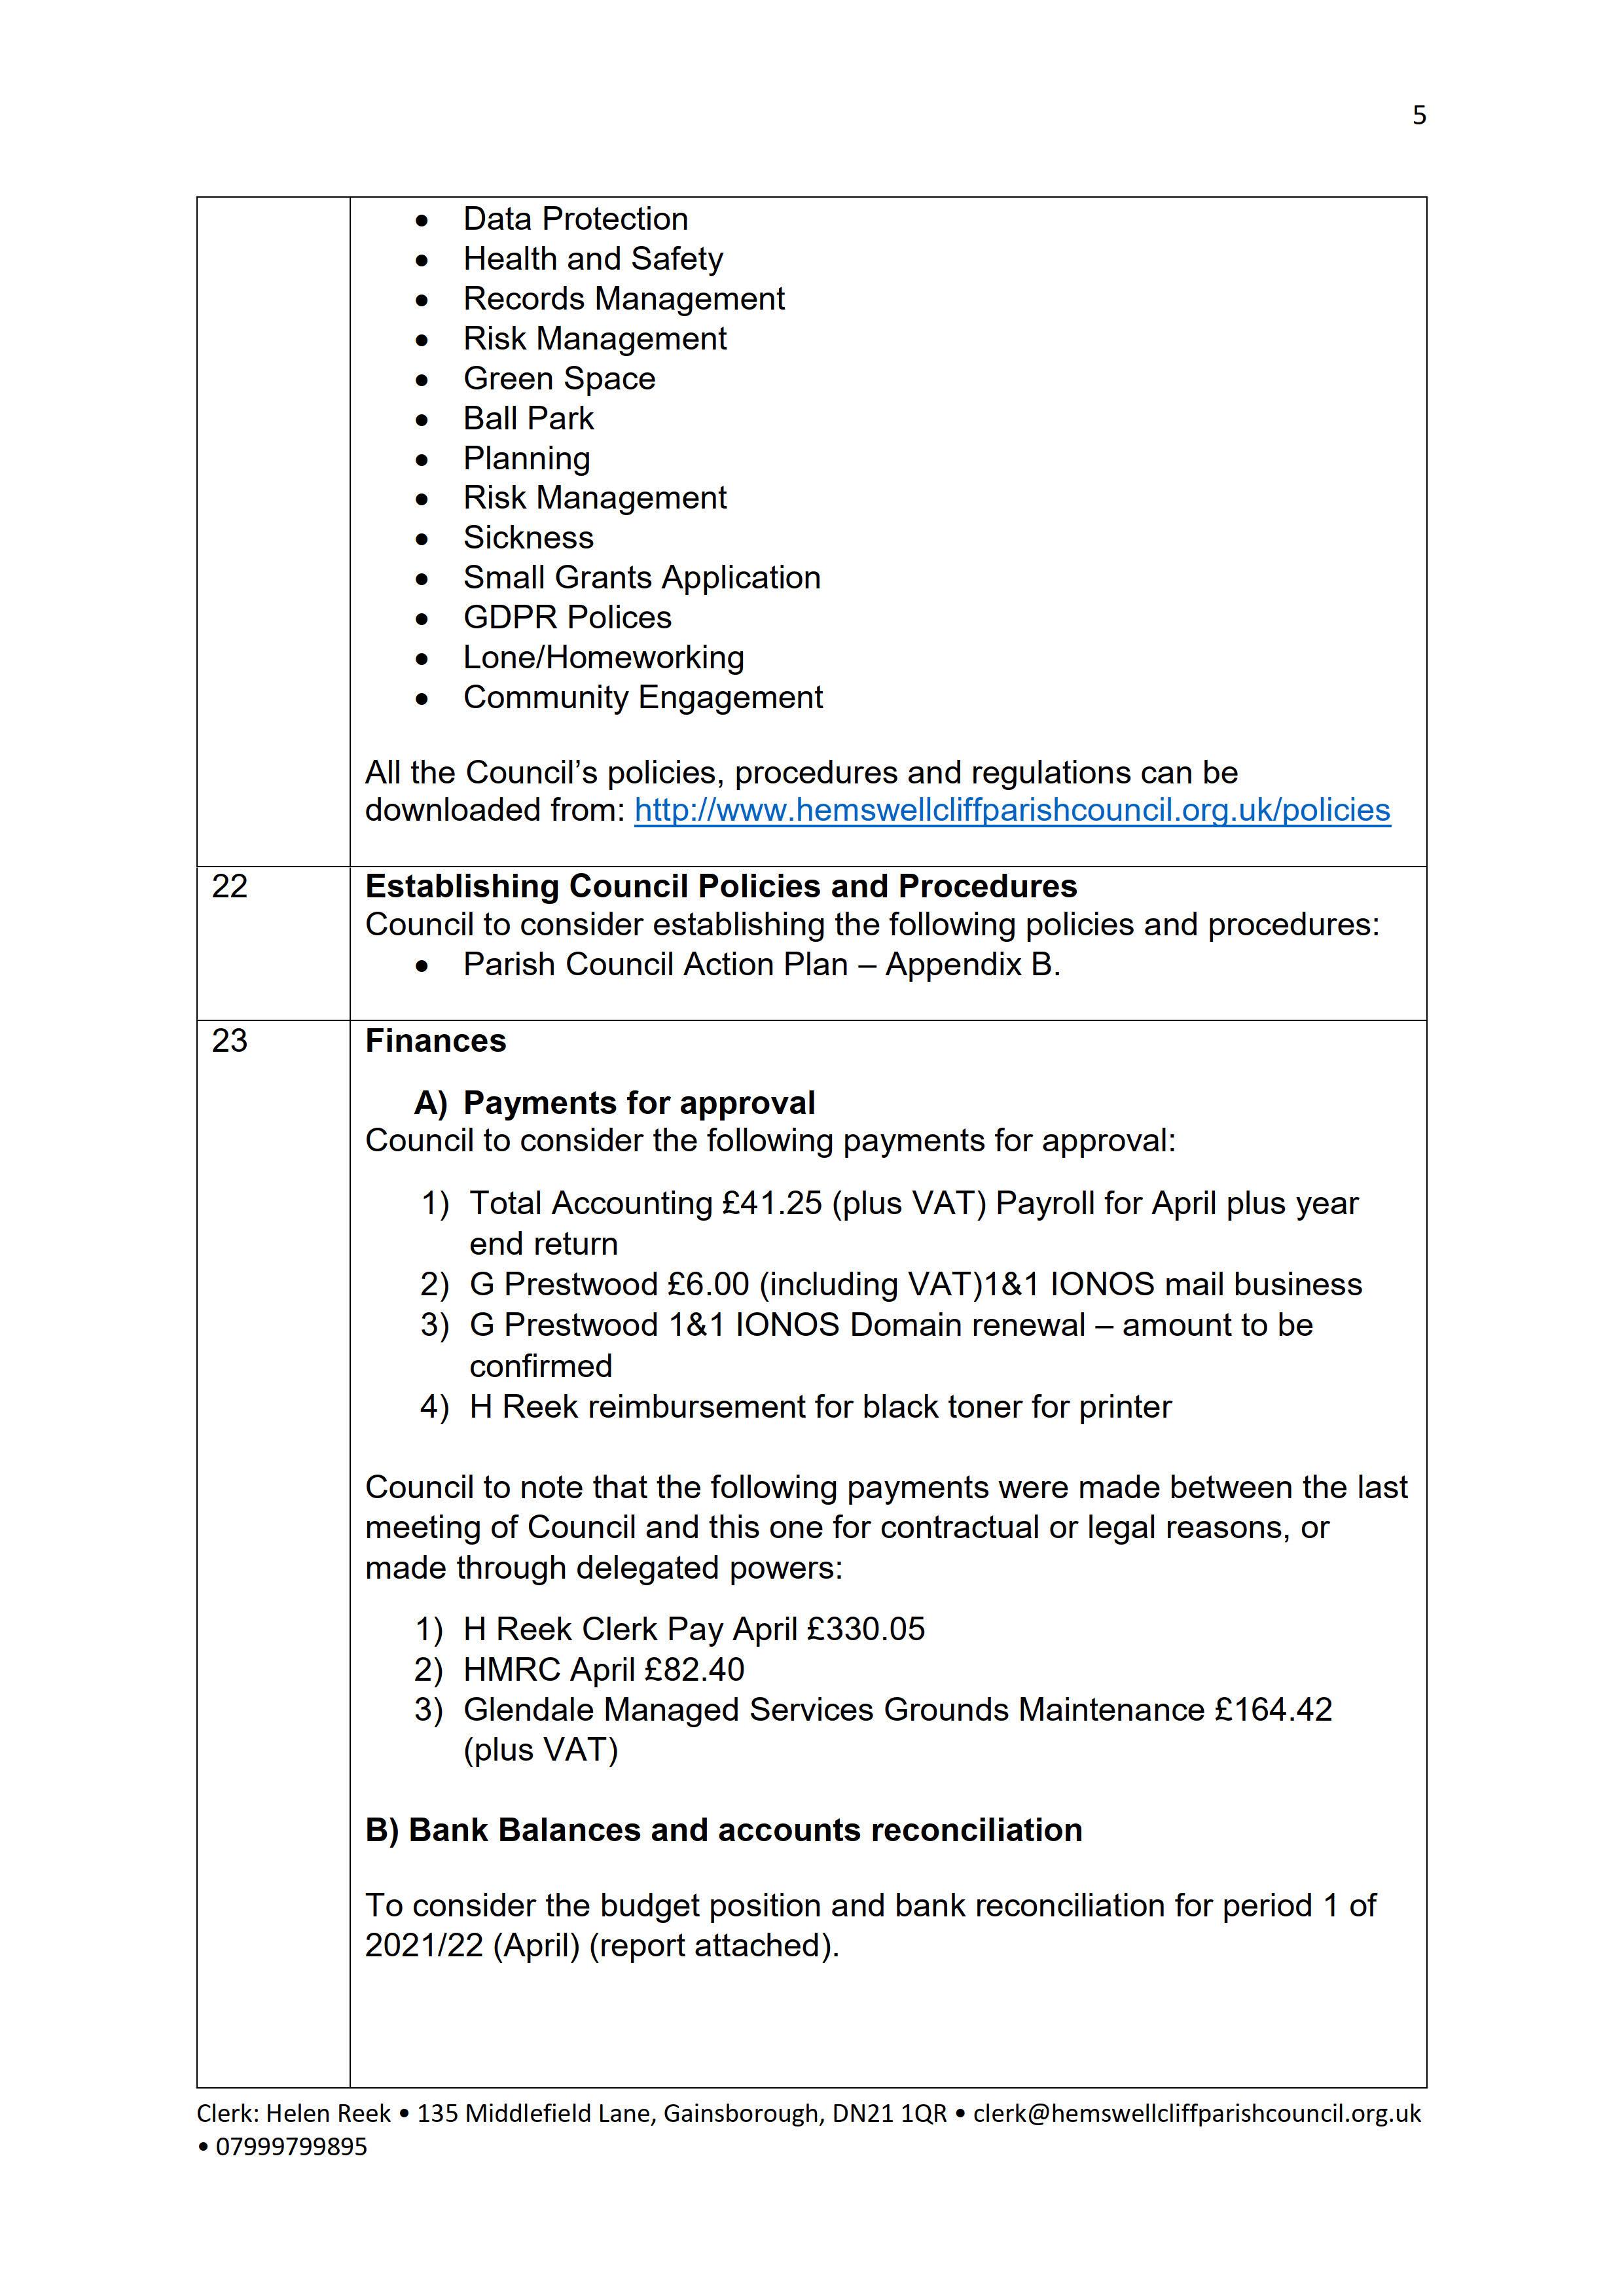 Annual_Meeting_Agenda_17.05.21_5.jpg